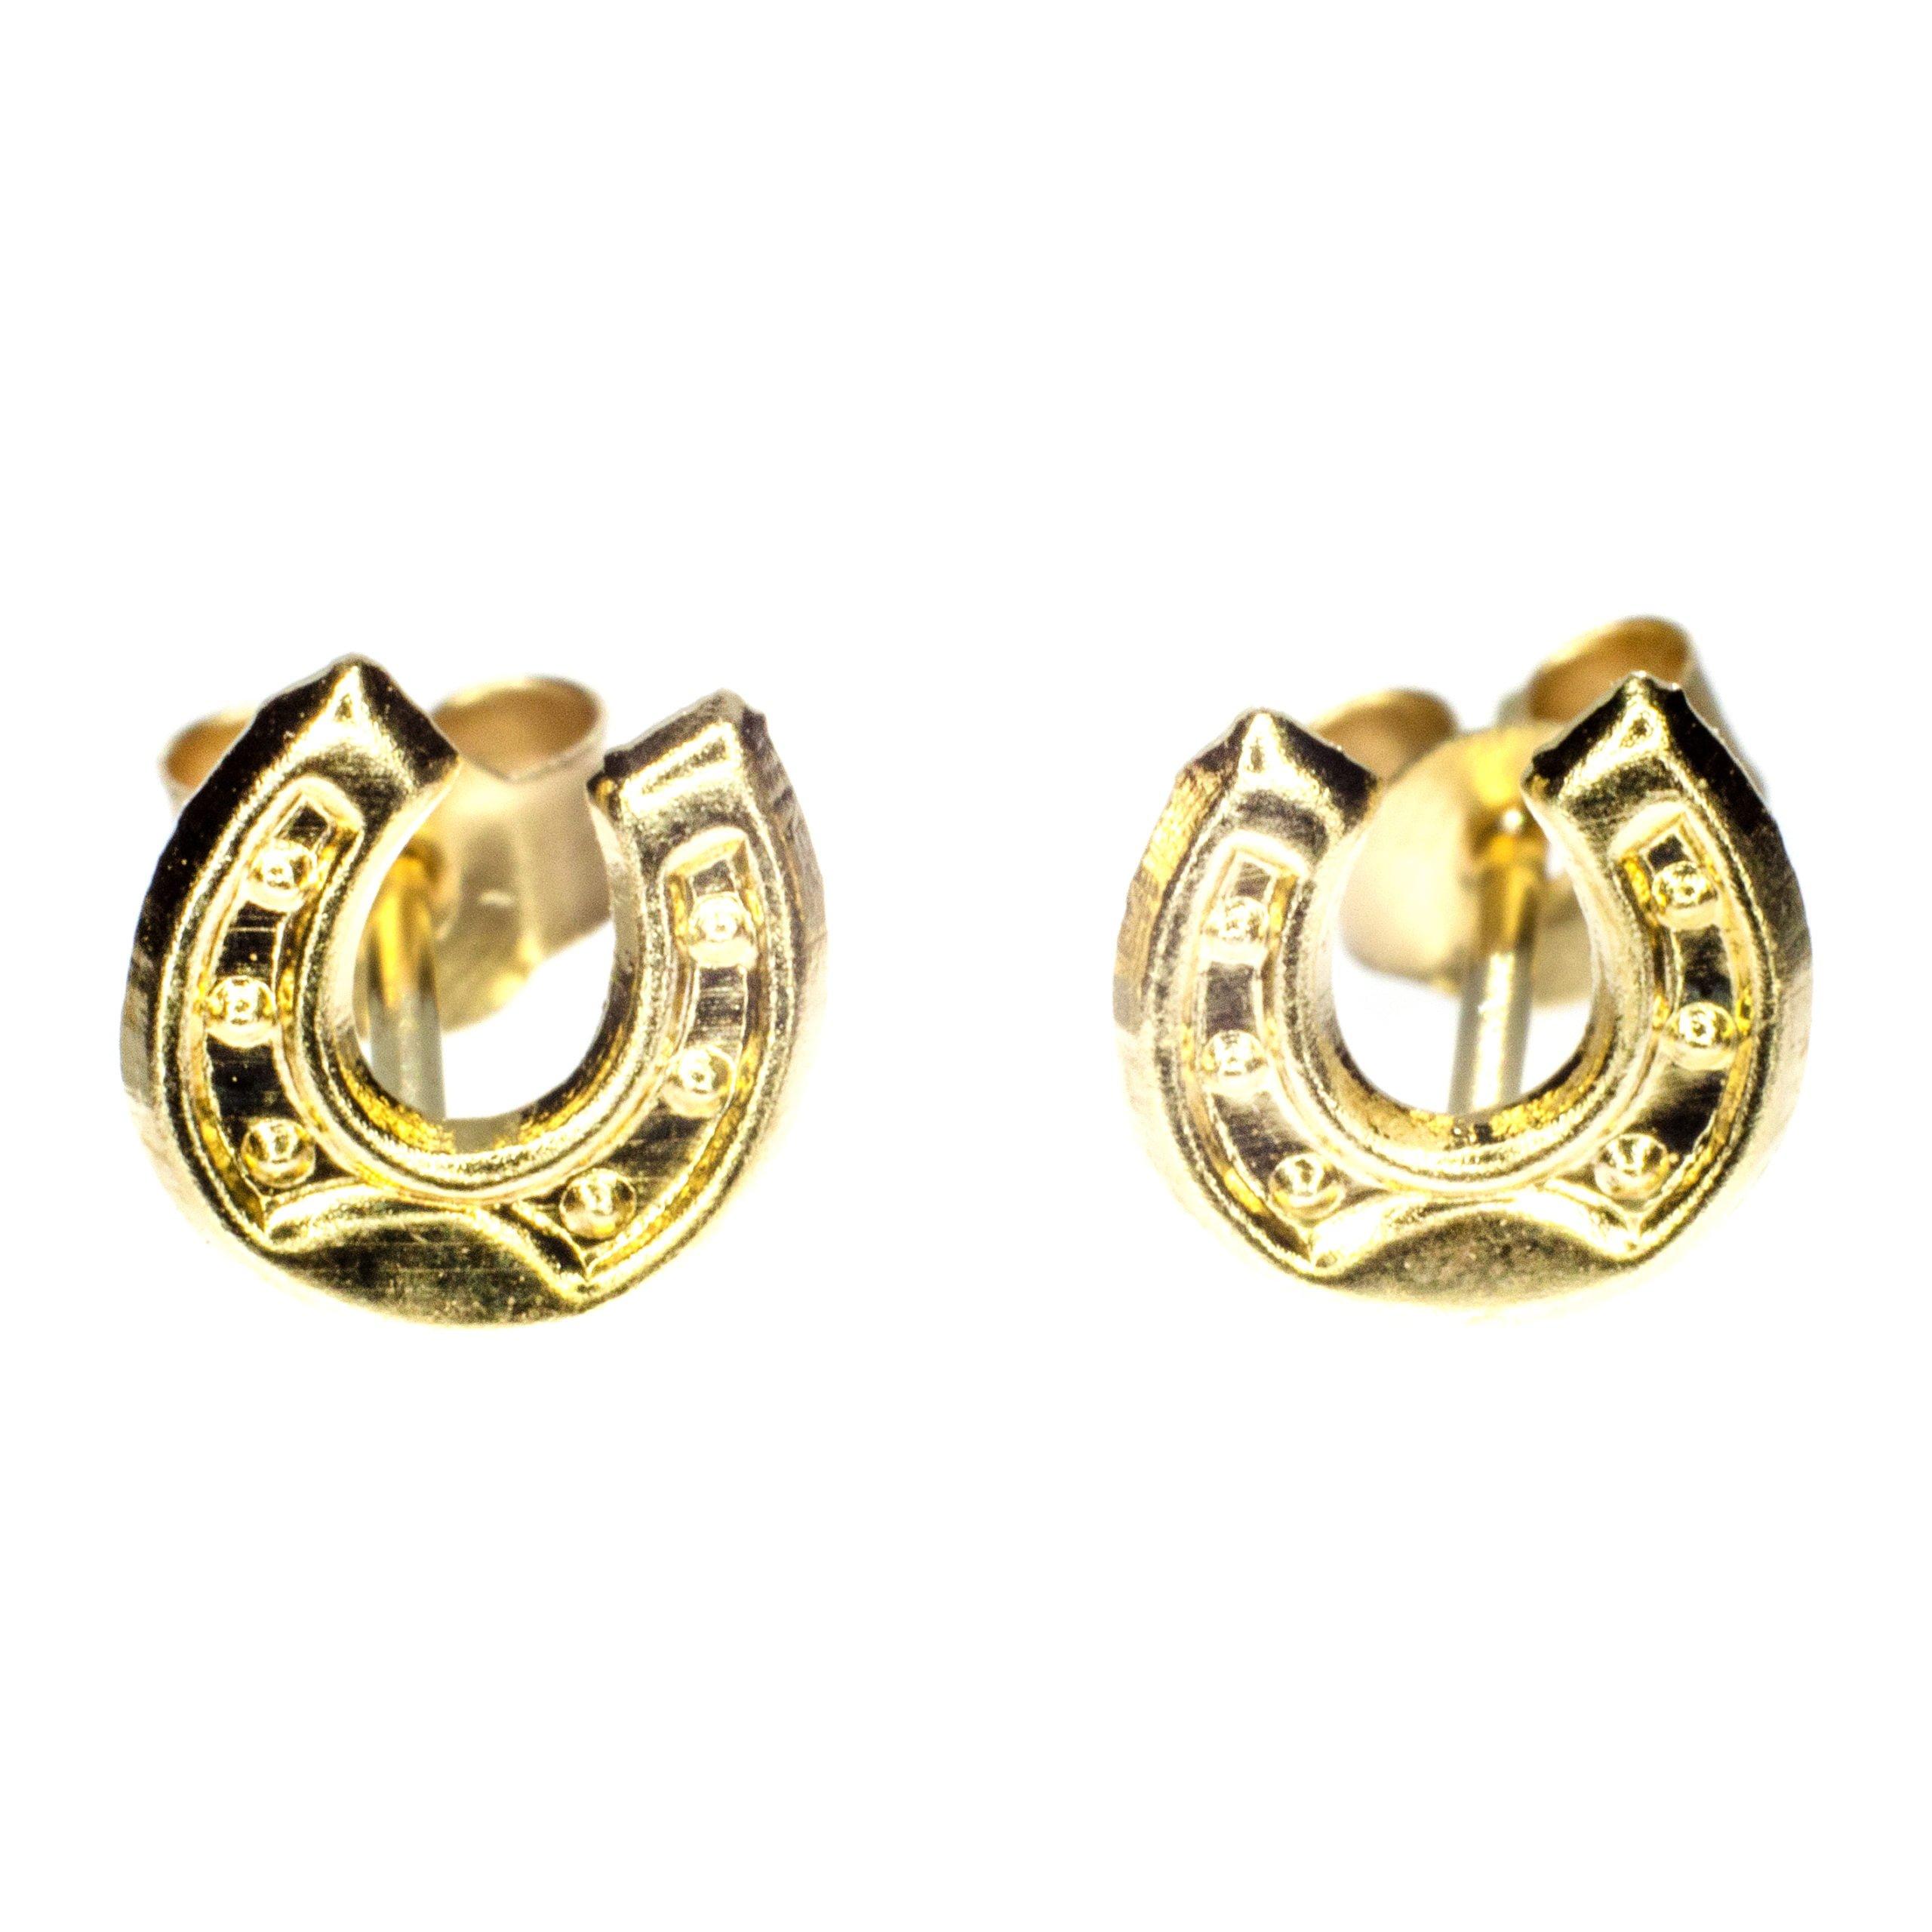 5mm horseshoe earrings 9ct yellow gold alt 1